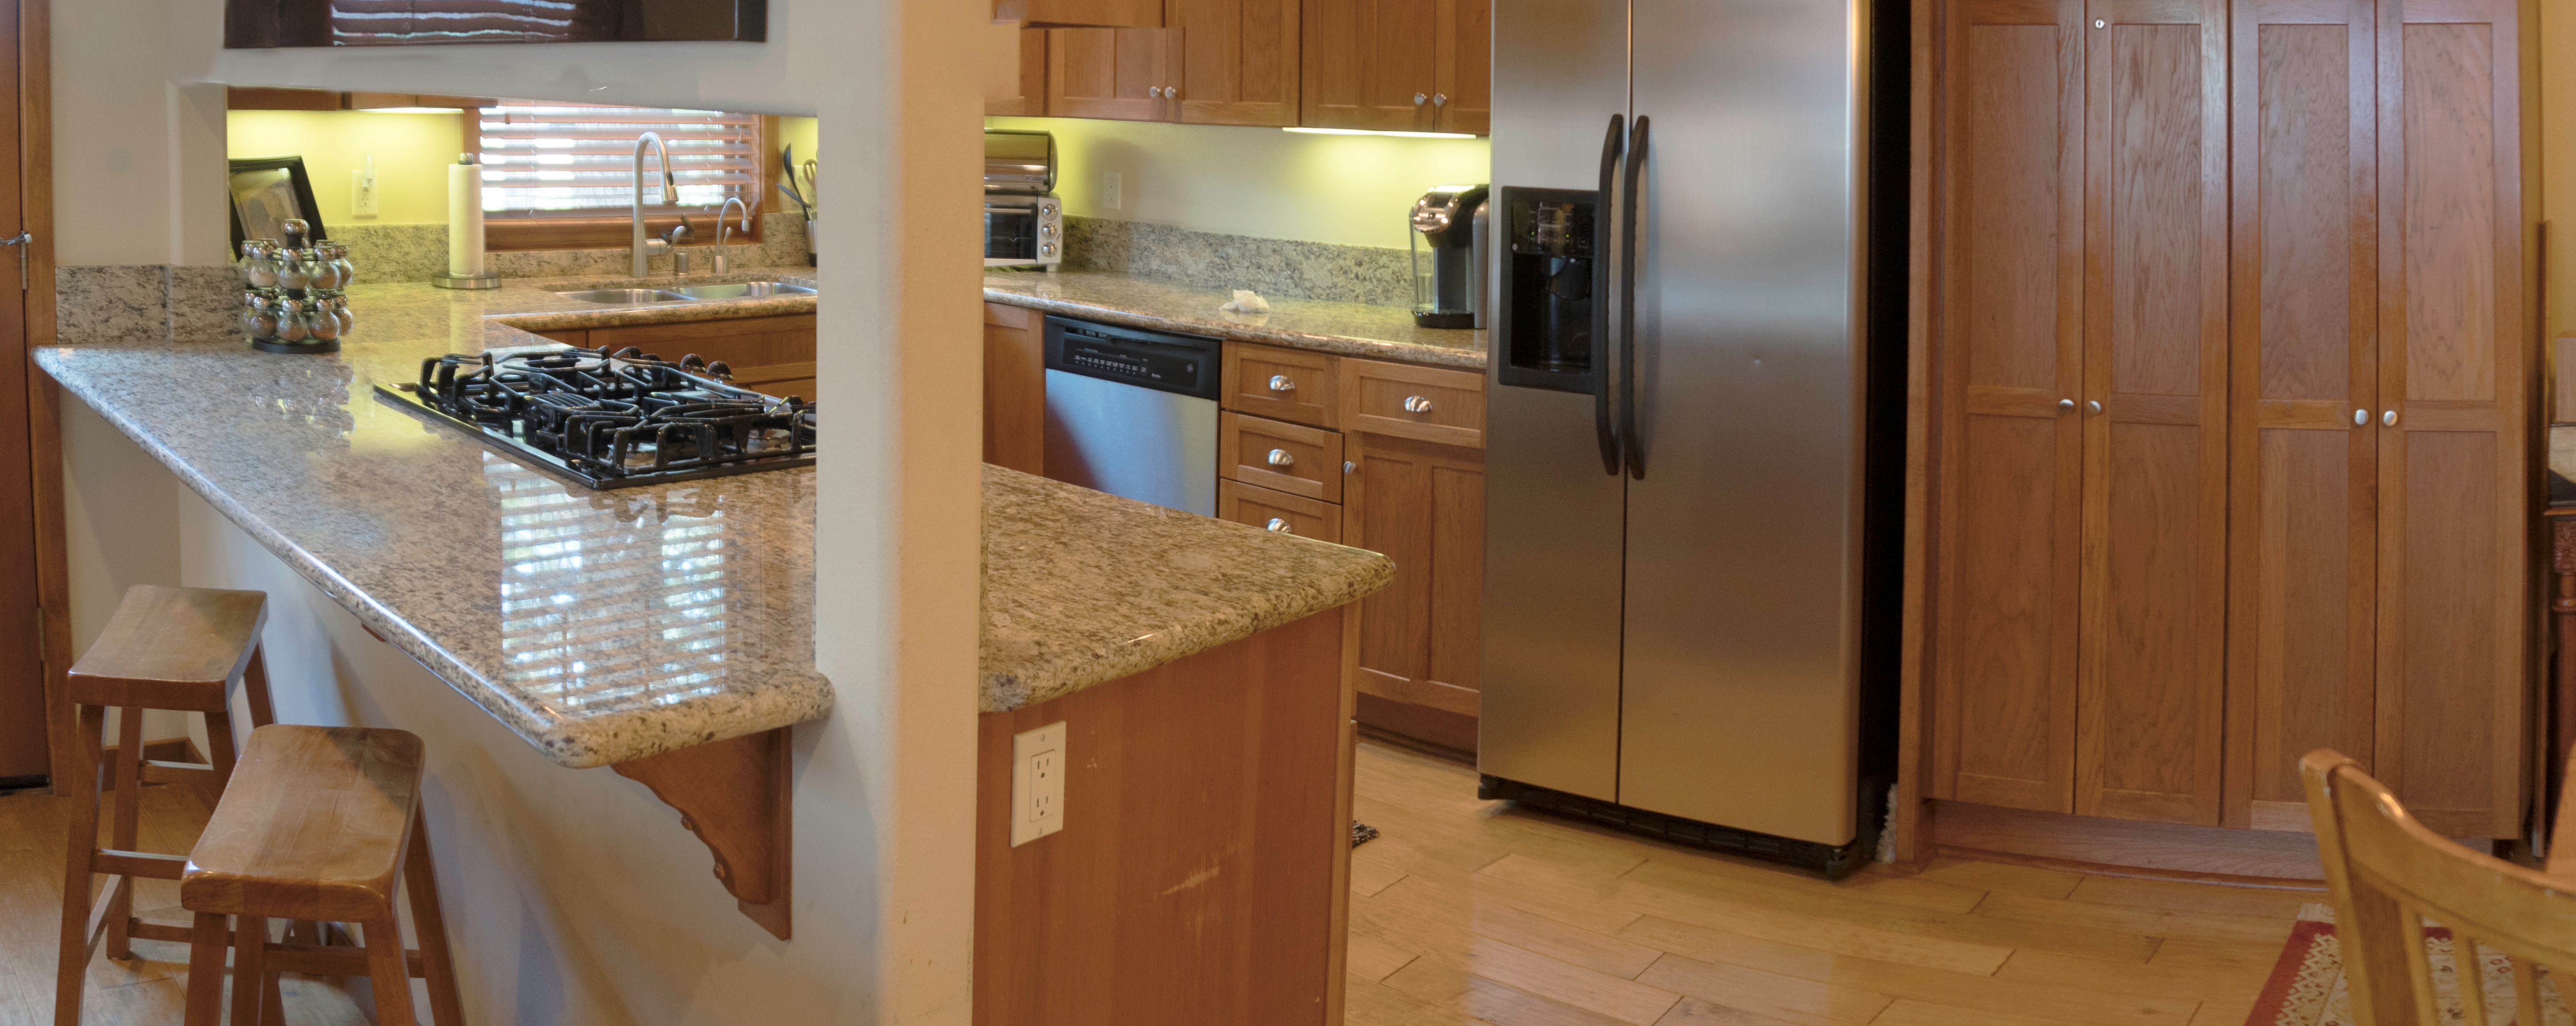 mammoth lakes kitchen